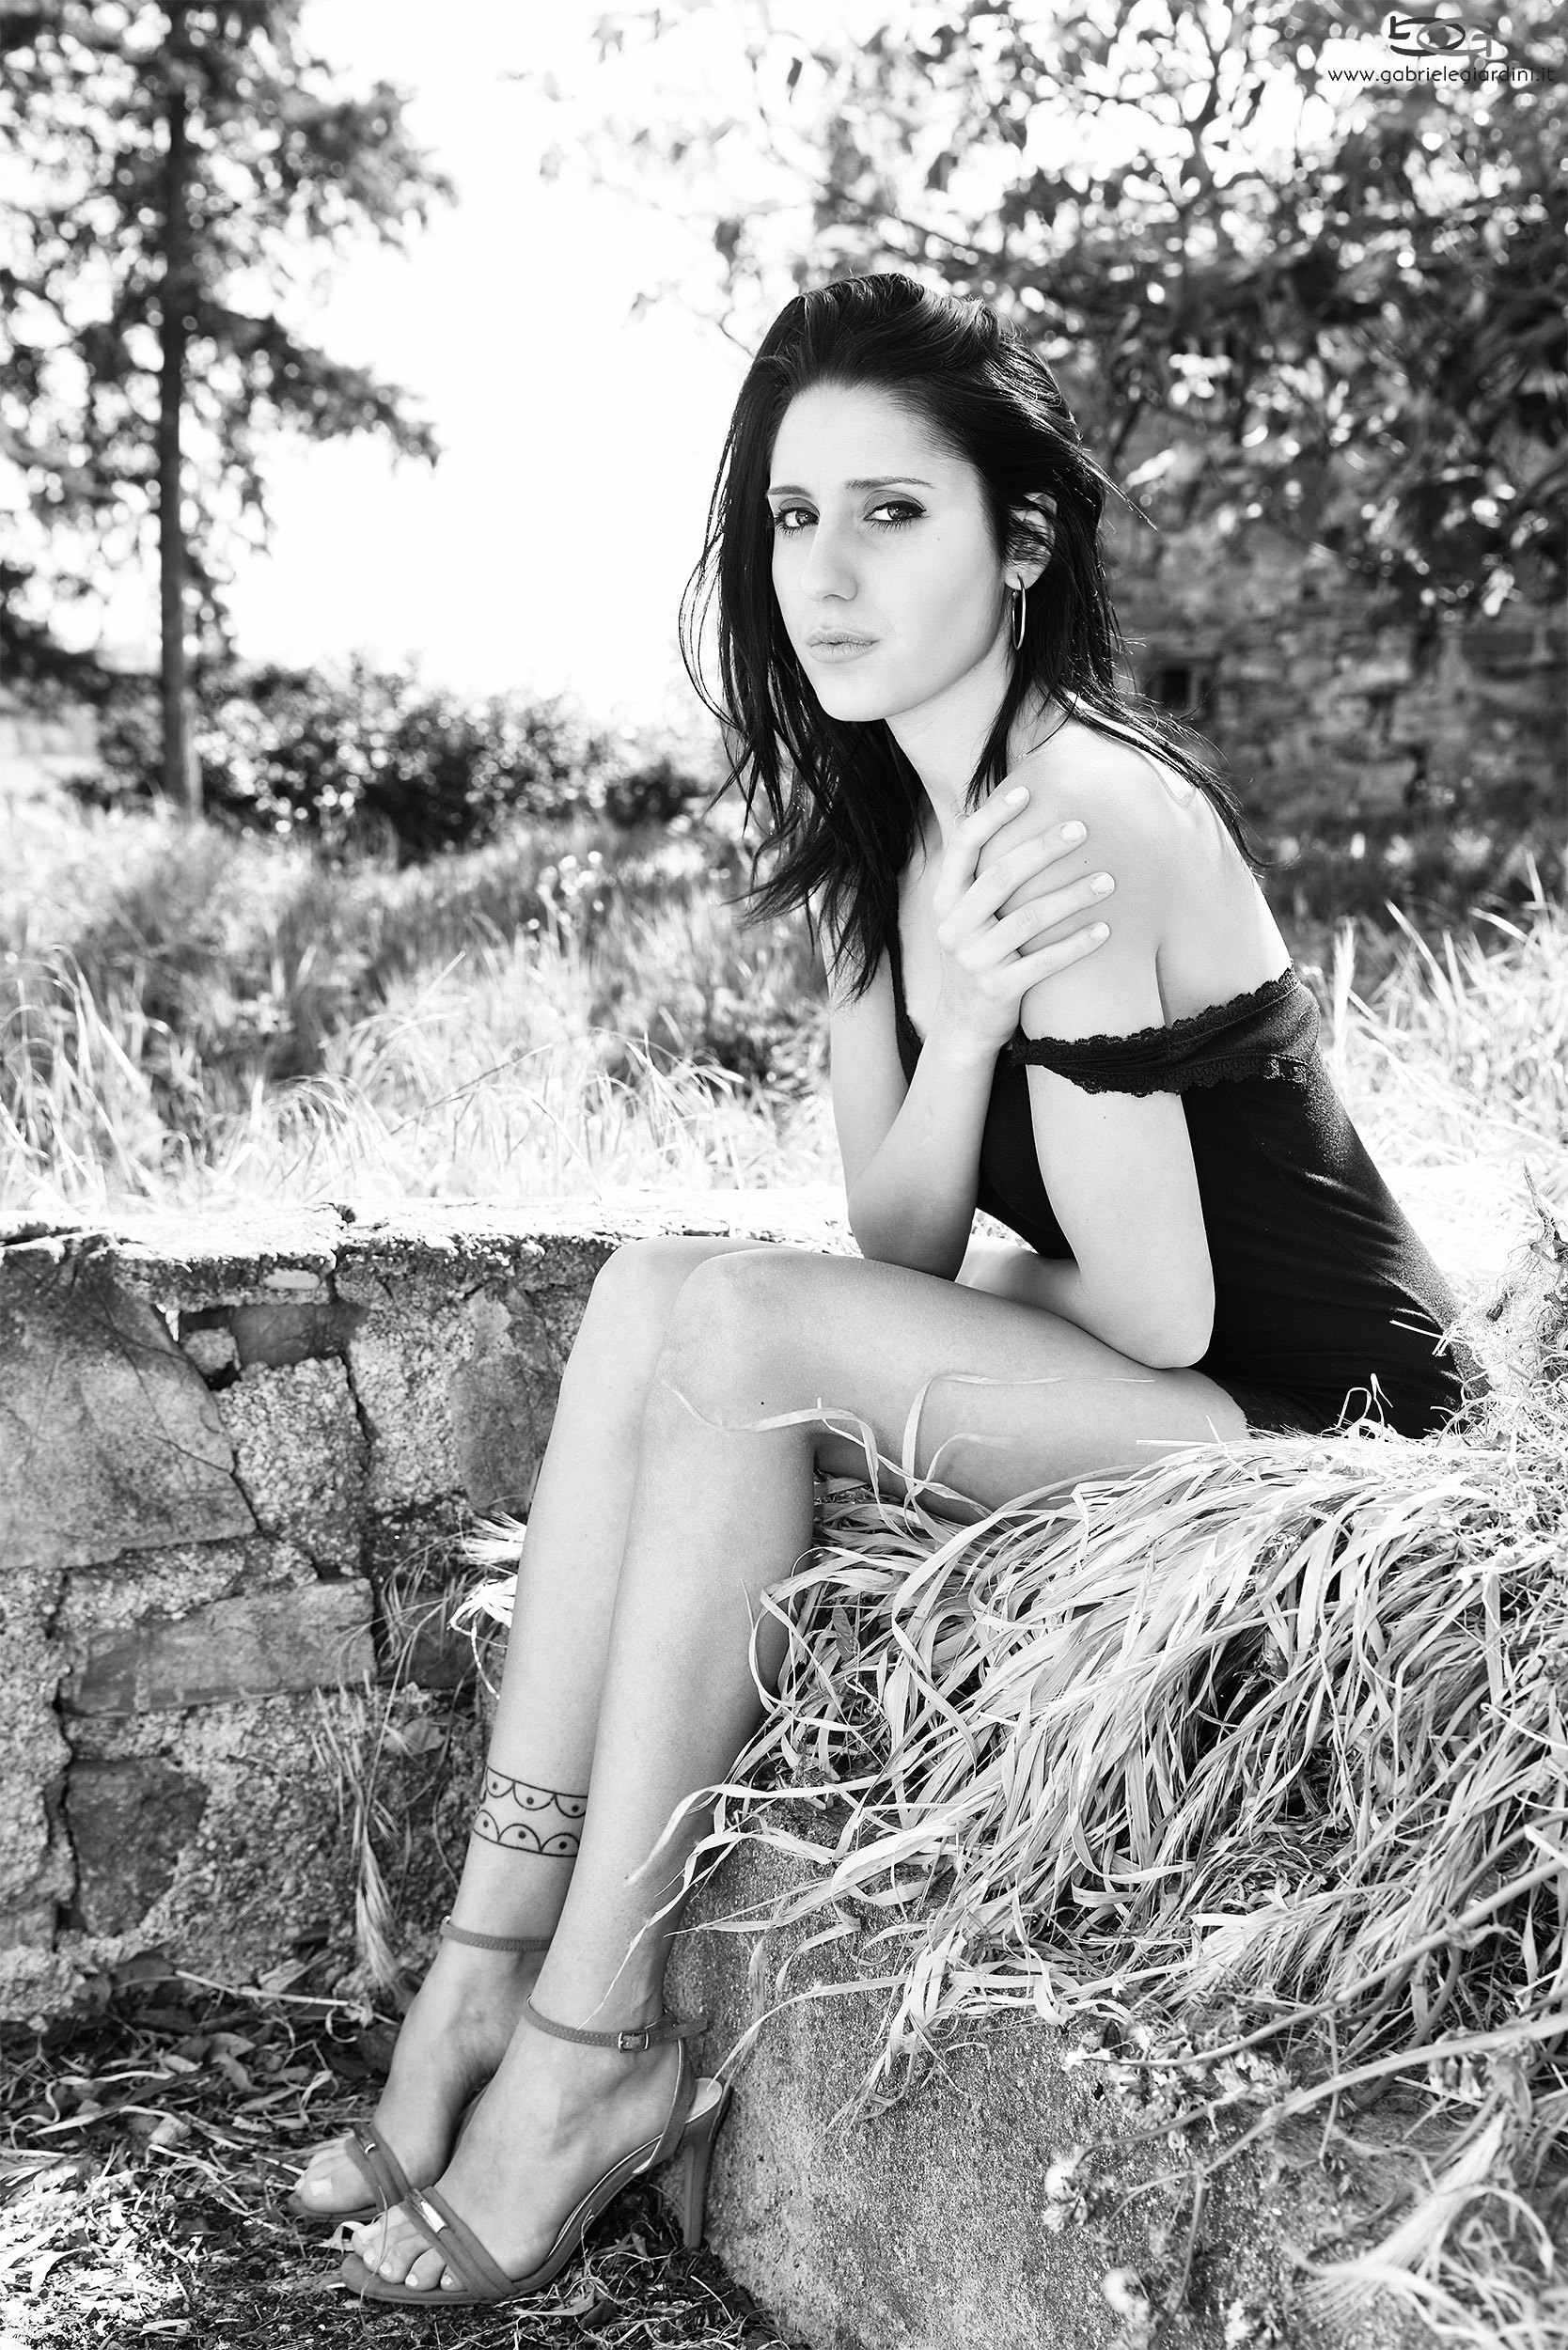 Categorie: Fashion, Portrait; Photographer: GABRIELE GIARDINI; Model: ROSARIA; Location:Poggibonsi, Siena, Italia